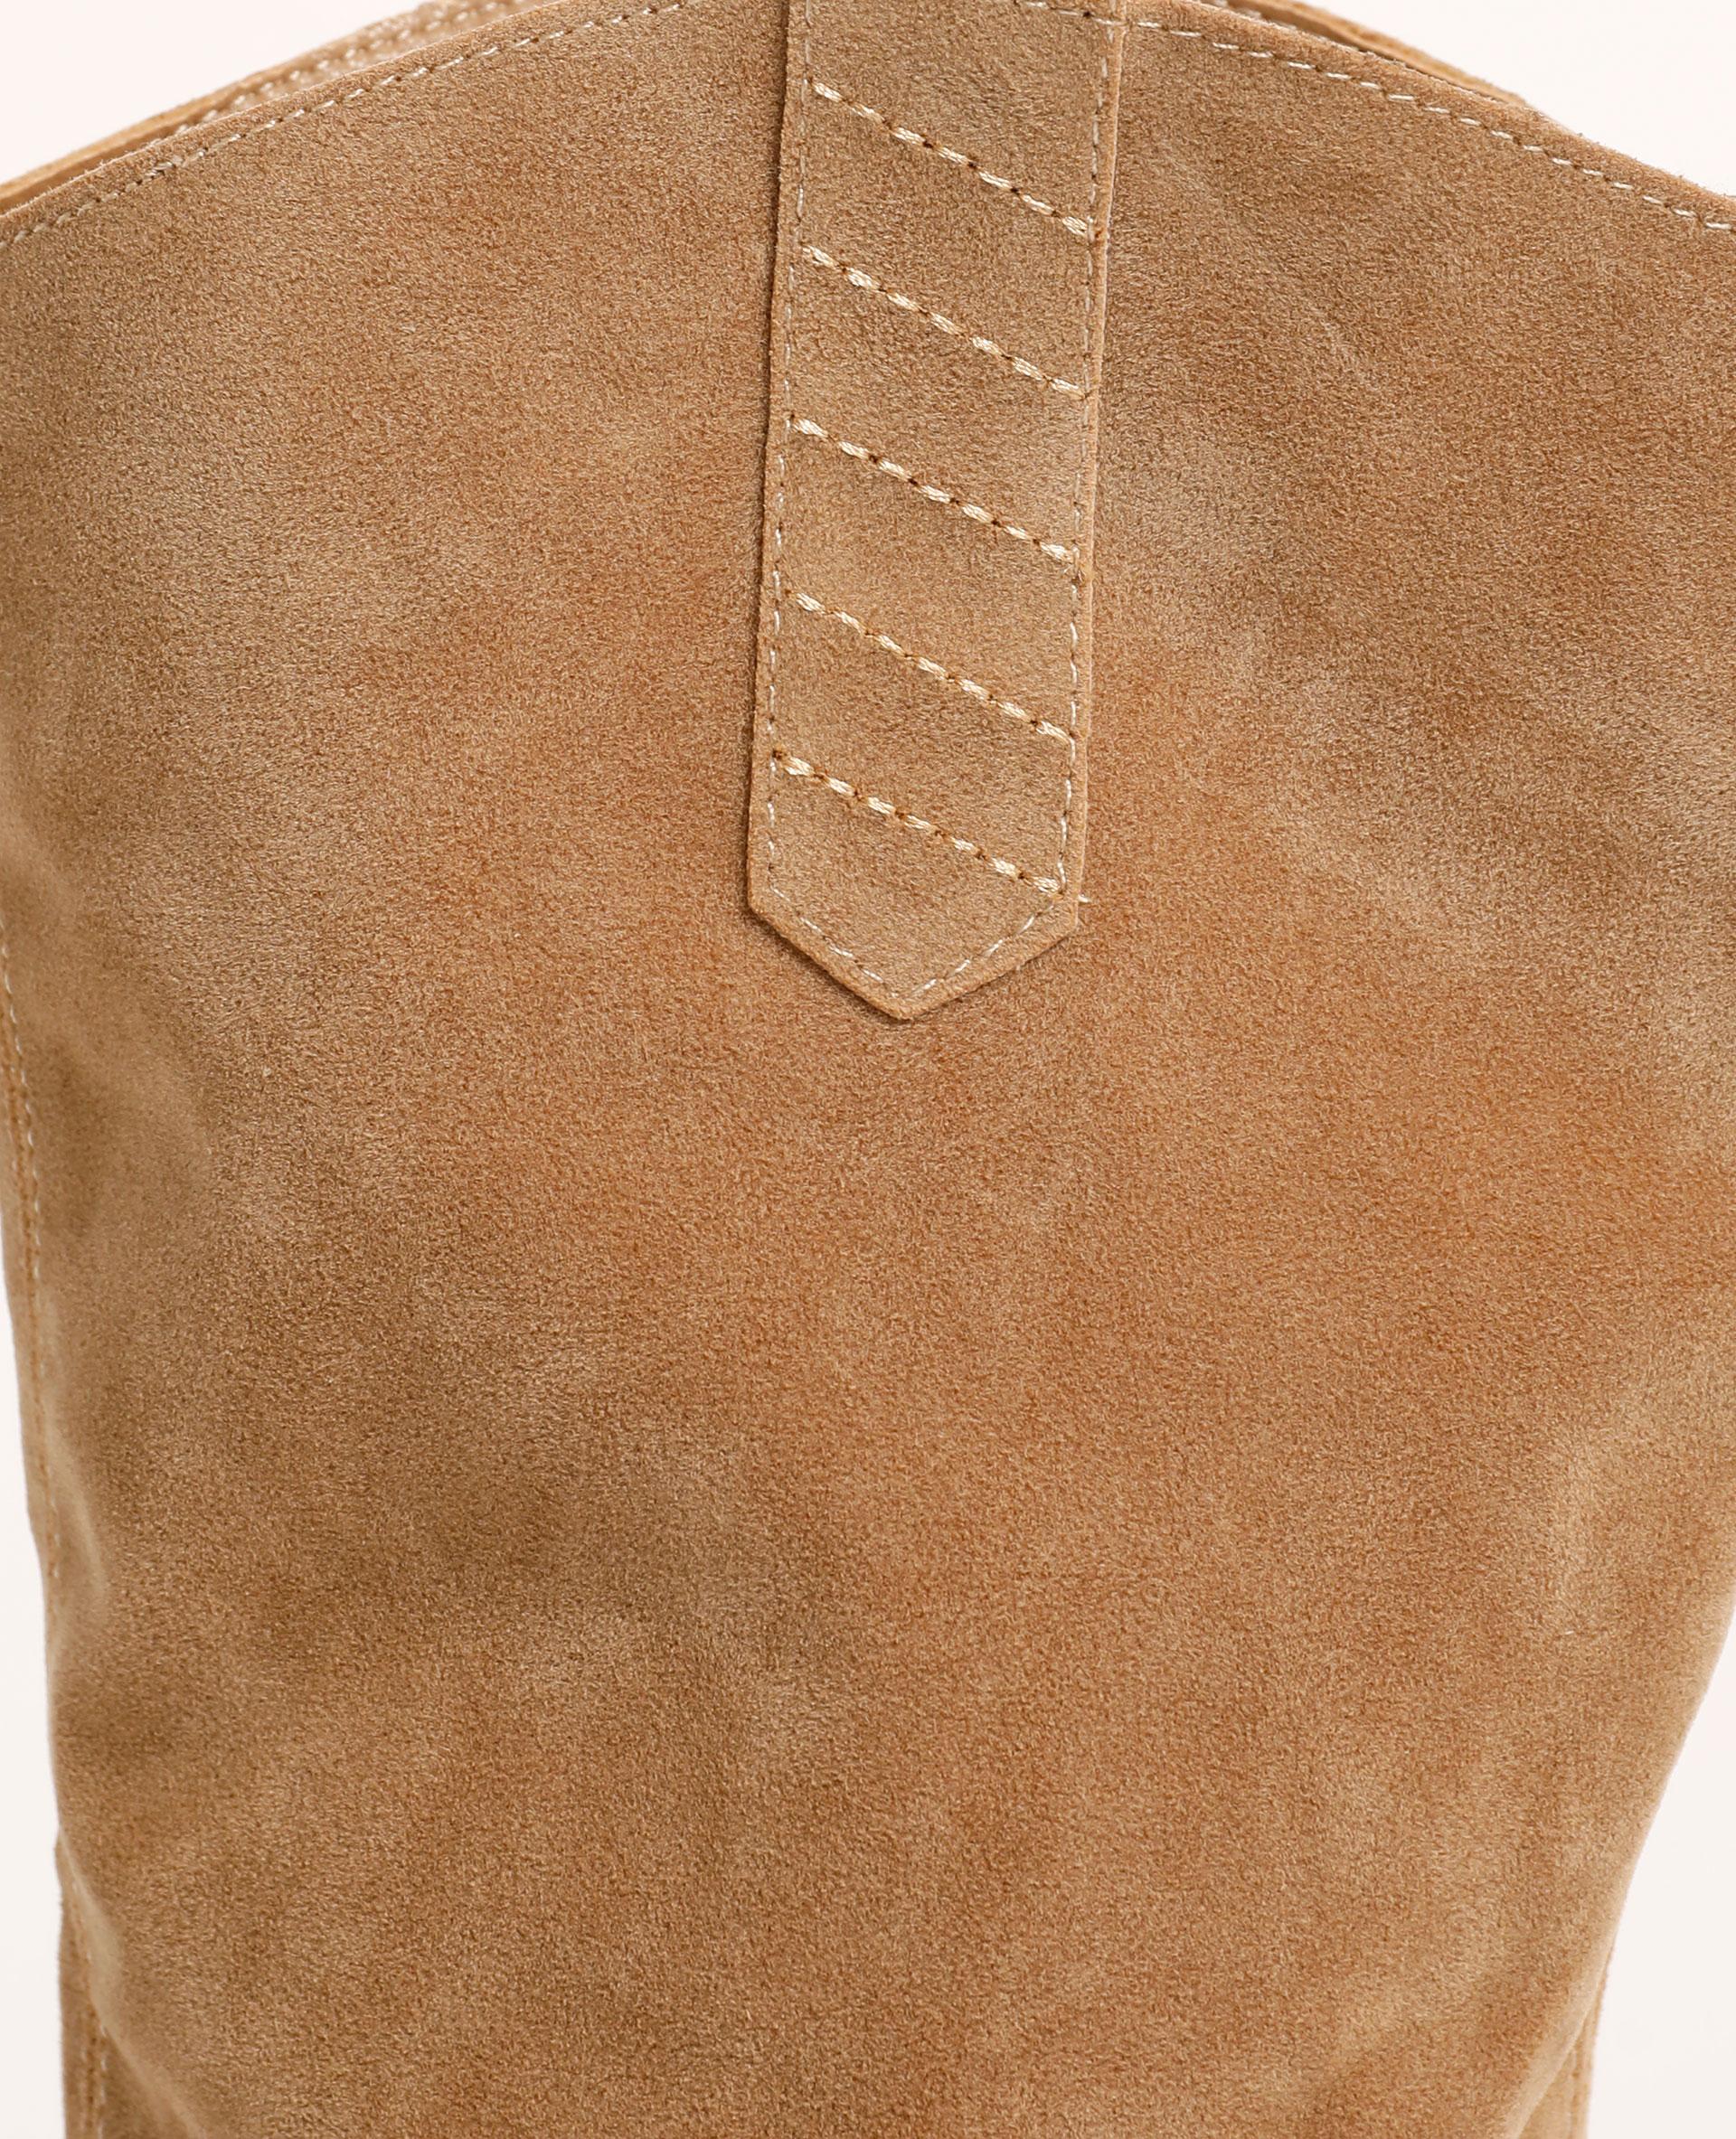 Stivaletti con tacco effetto nabuck beige - Pimkie